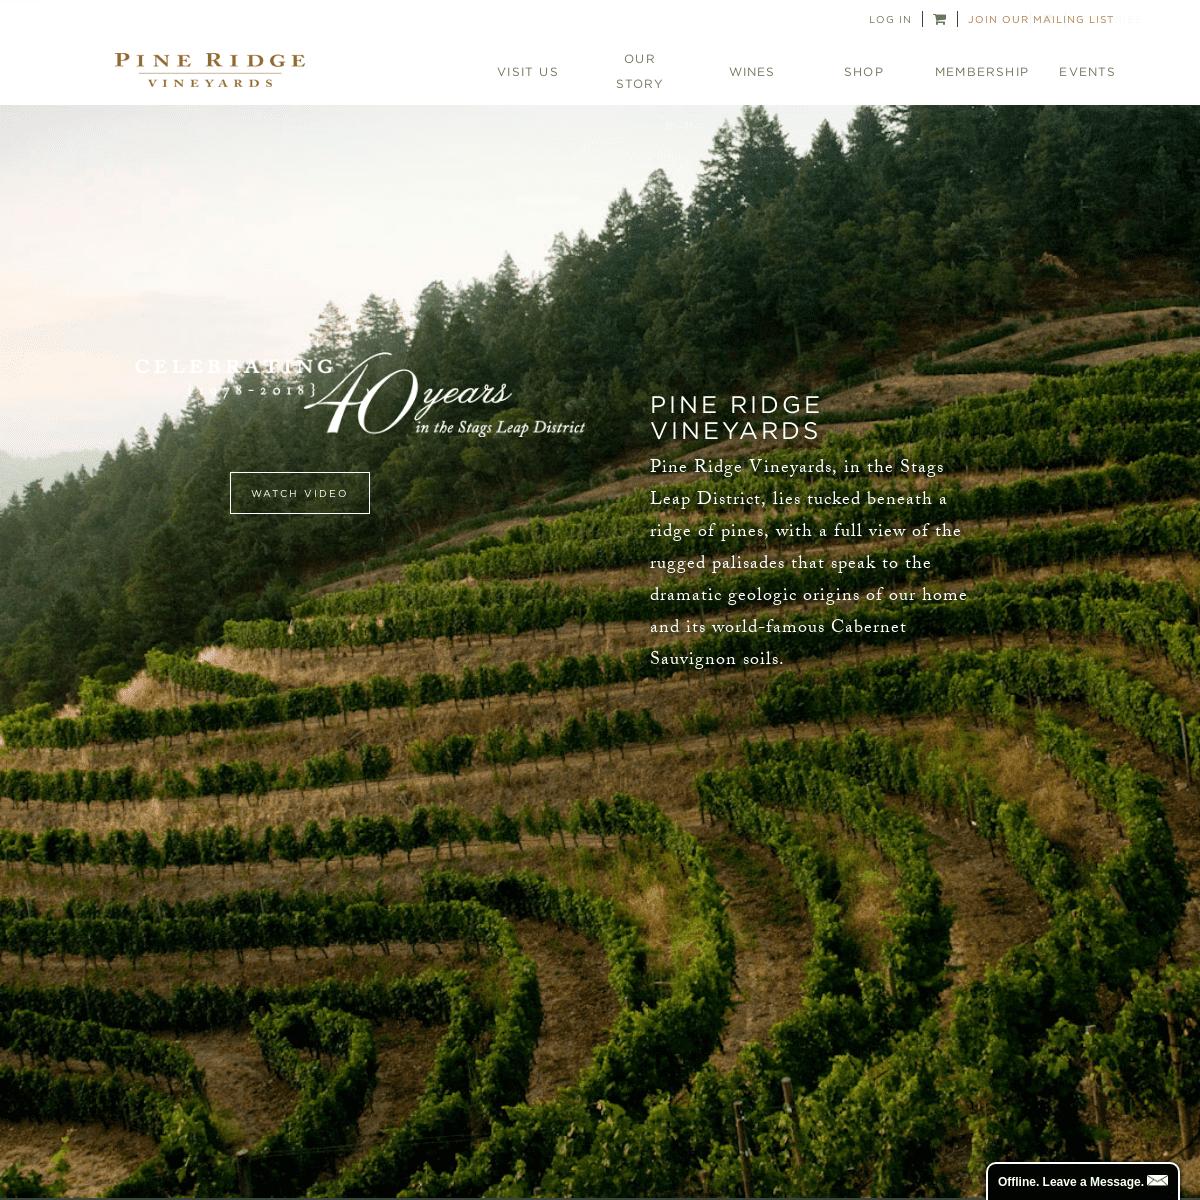 Pine Ridge Vineyards - Stags Leap District - Napa Valley ...